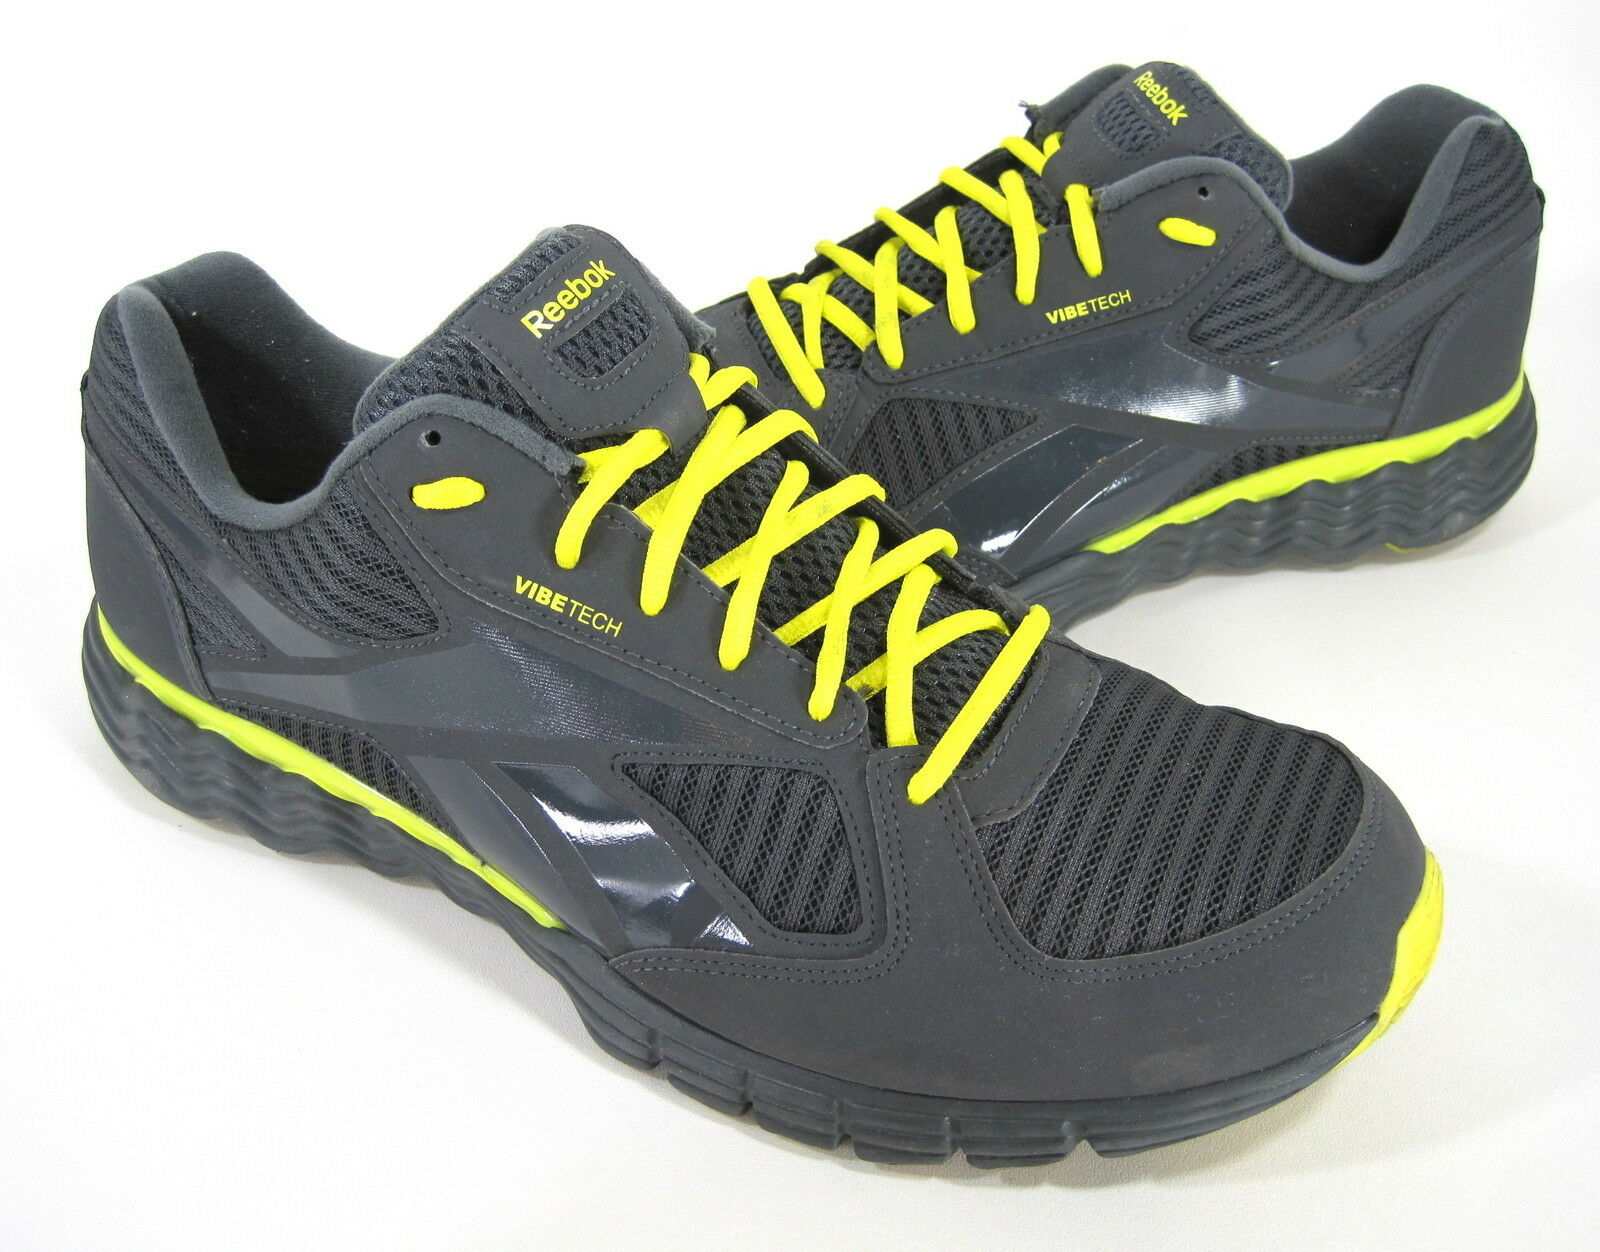 REEBOK Homme ULTIMATEVIBE RUNNING Chaussures TAR/GRAVEL/SUN ROCK US SZ 13 MEDIUM (B)M